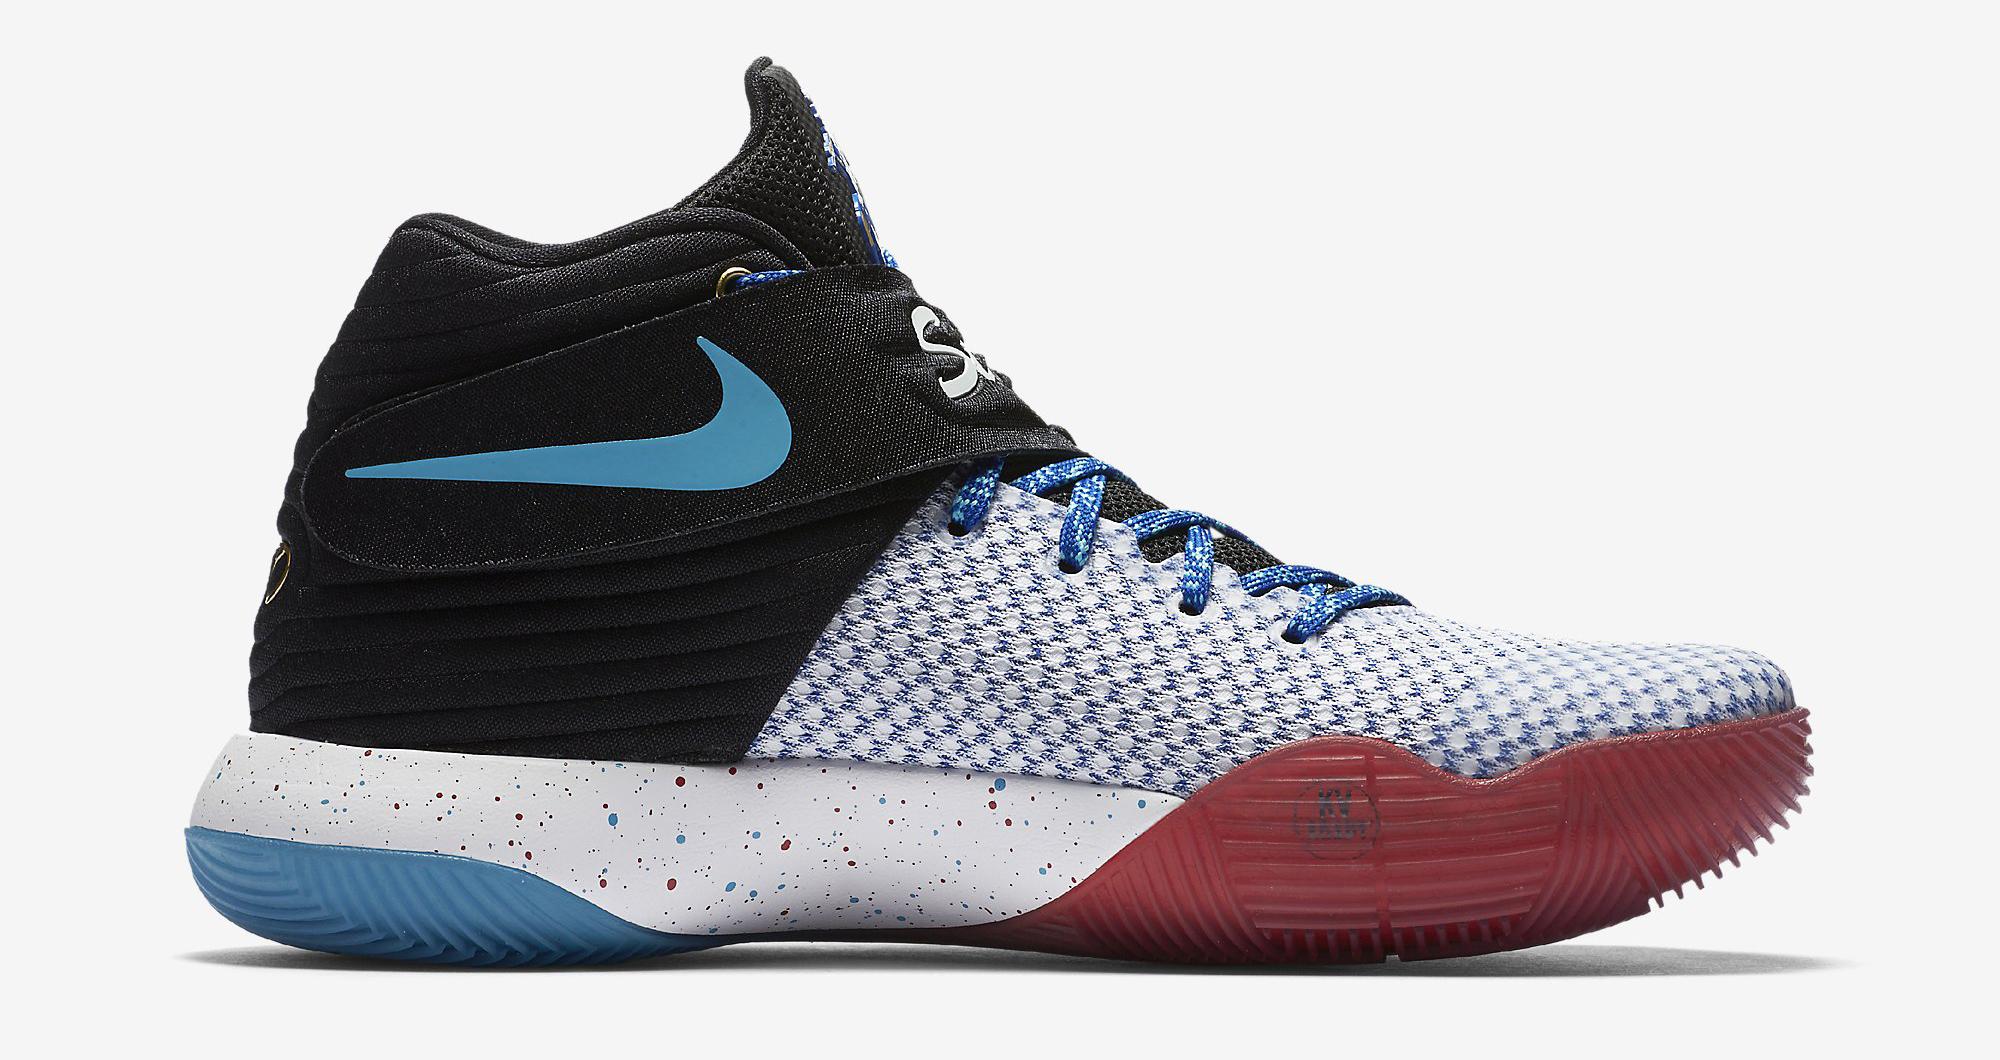 Nike Kyrie 2 Doernbecher 898641-001 Medial